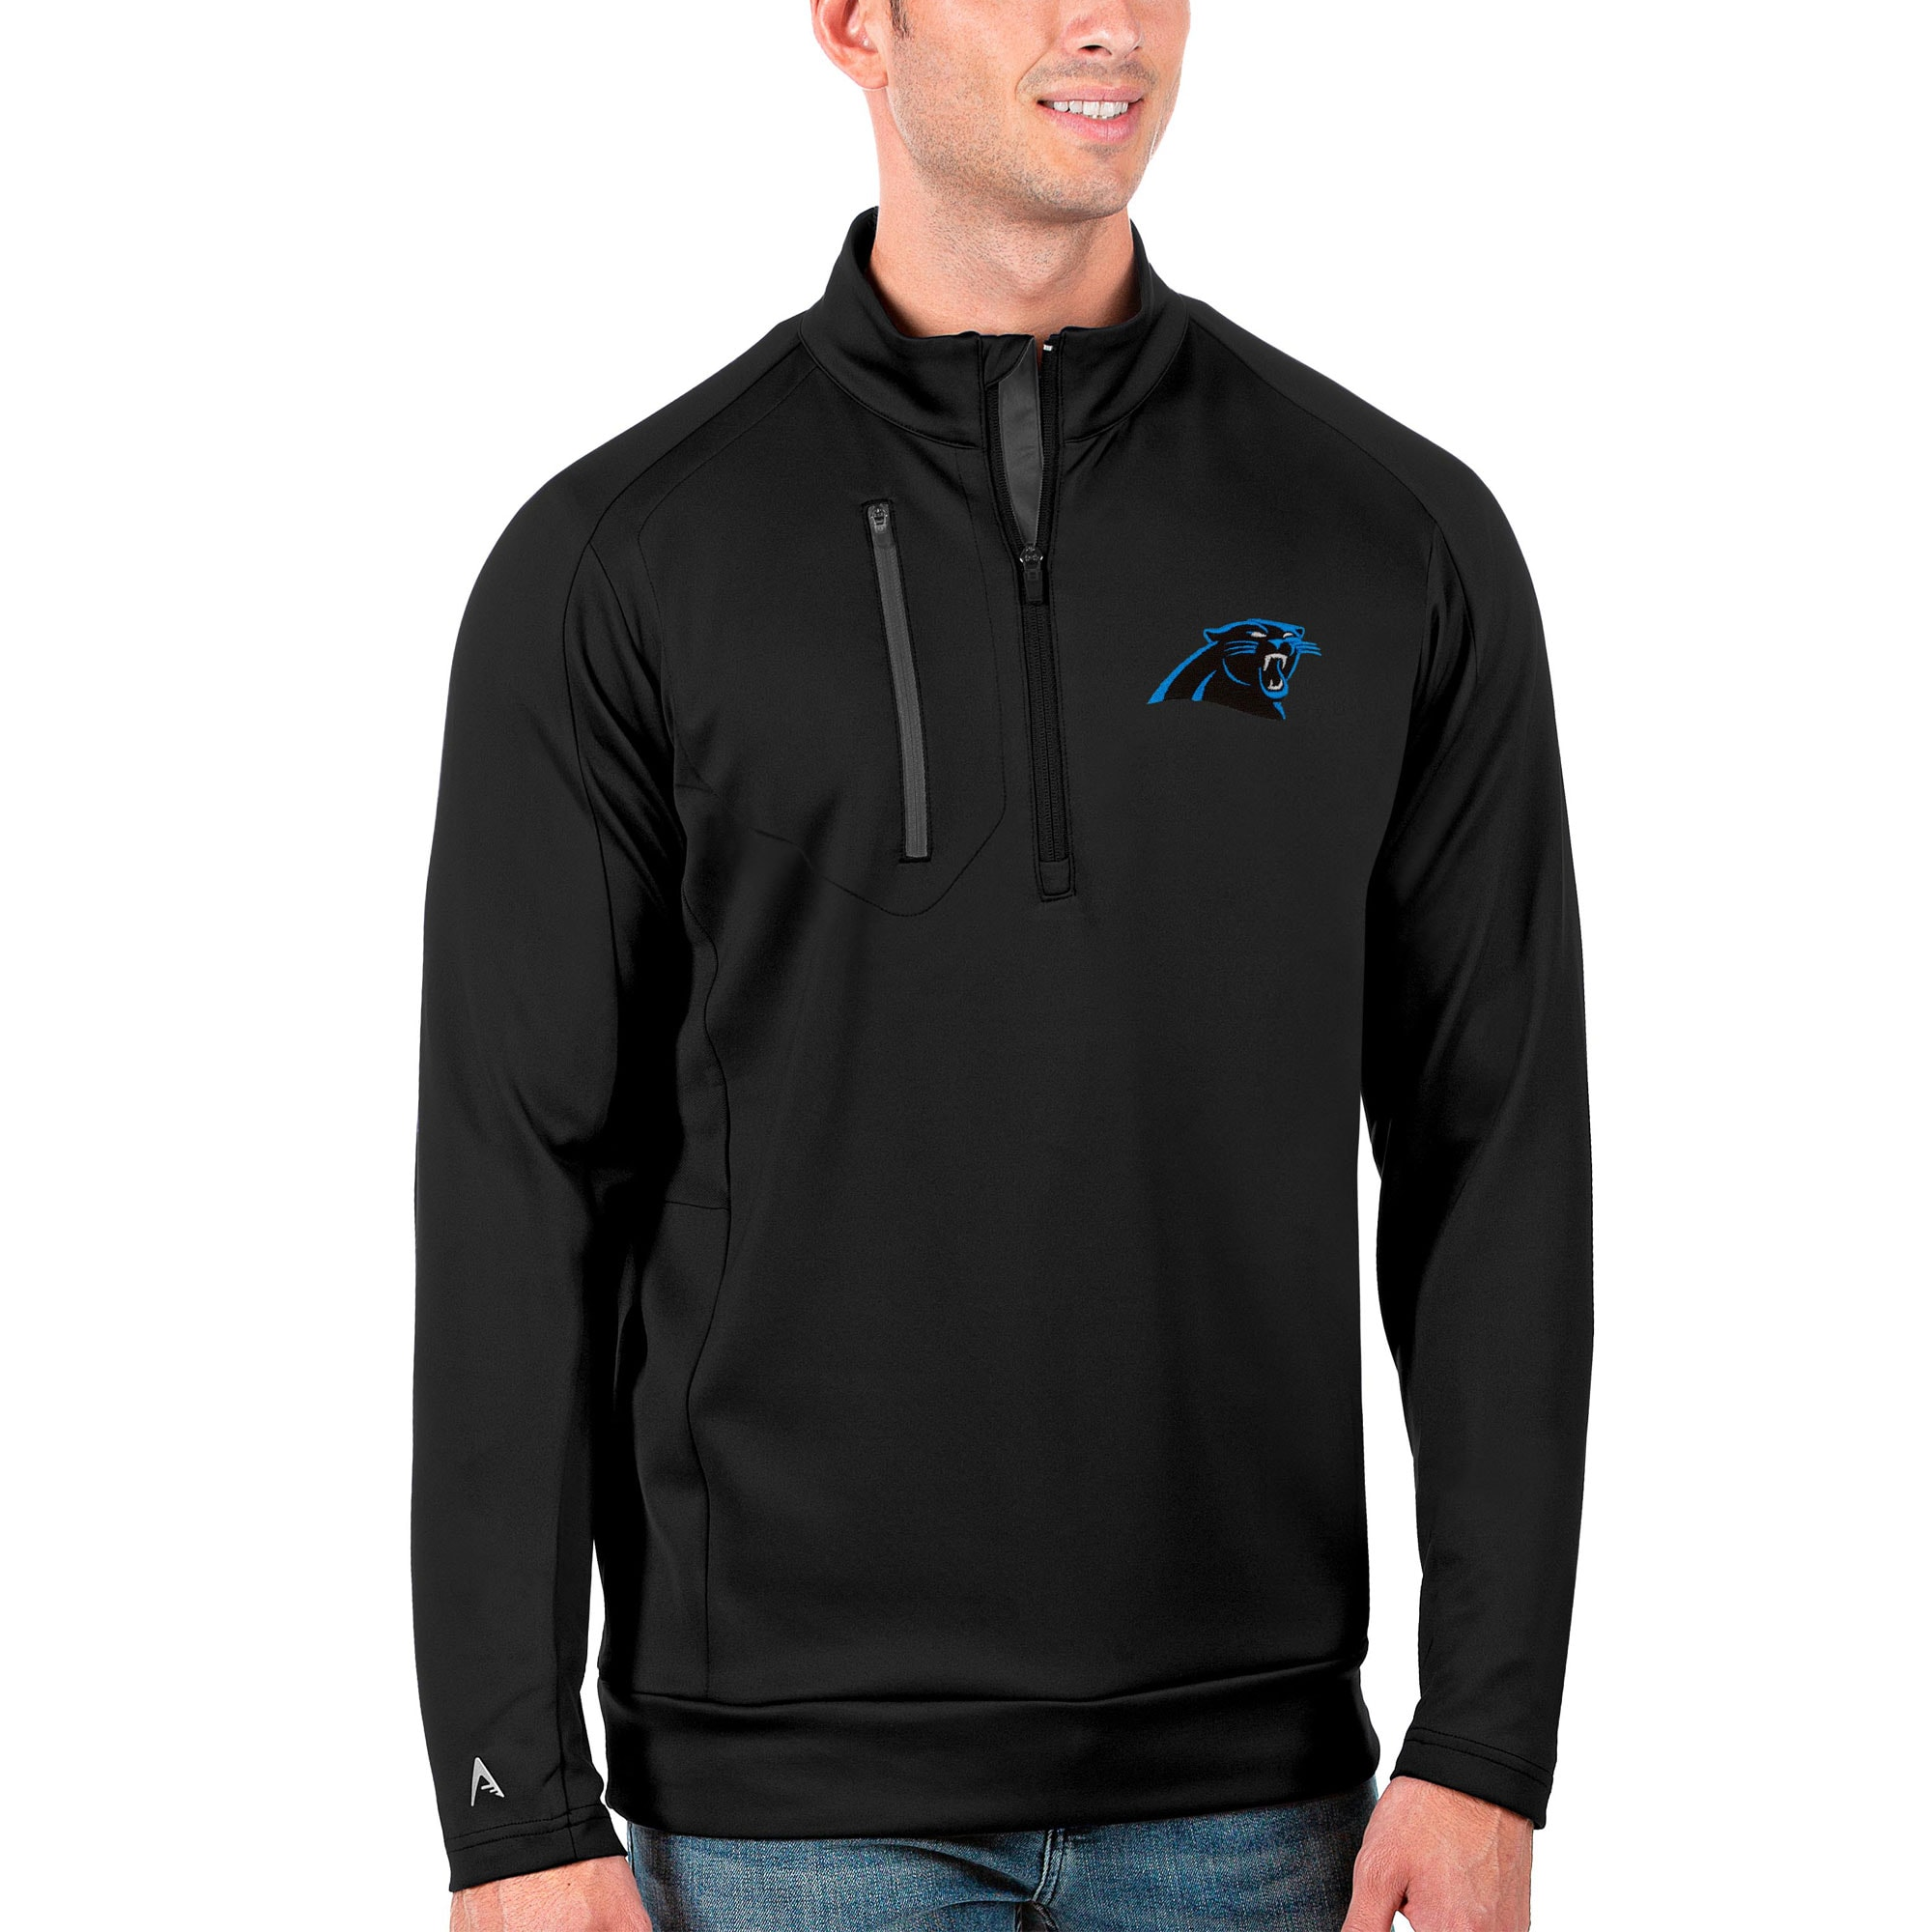 Carolina Panthers Antigua Generation Quarter-Zip Pullover Jacket - Black/Charcoal